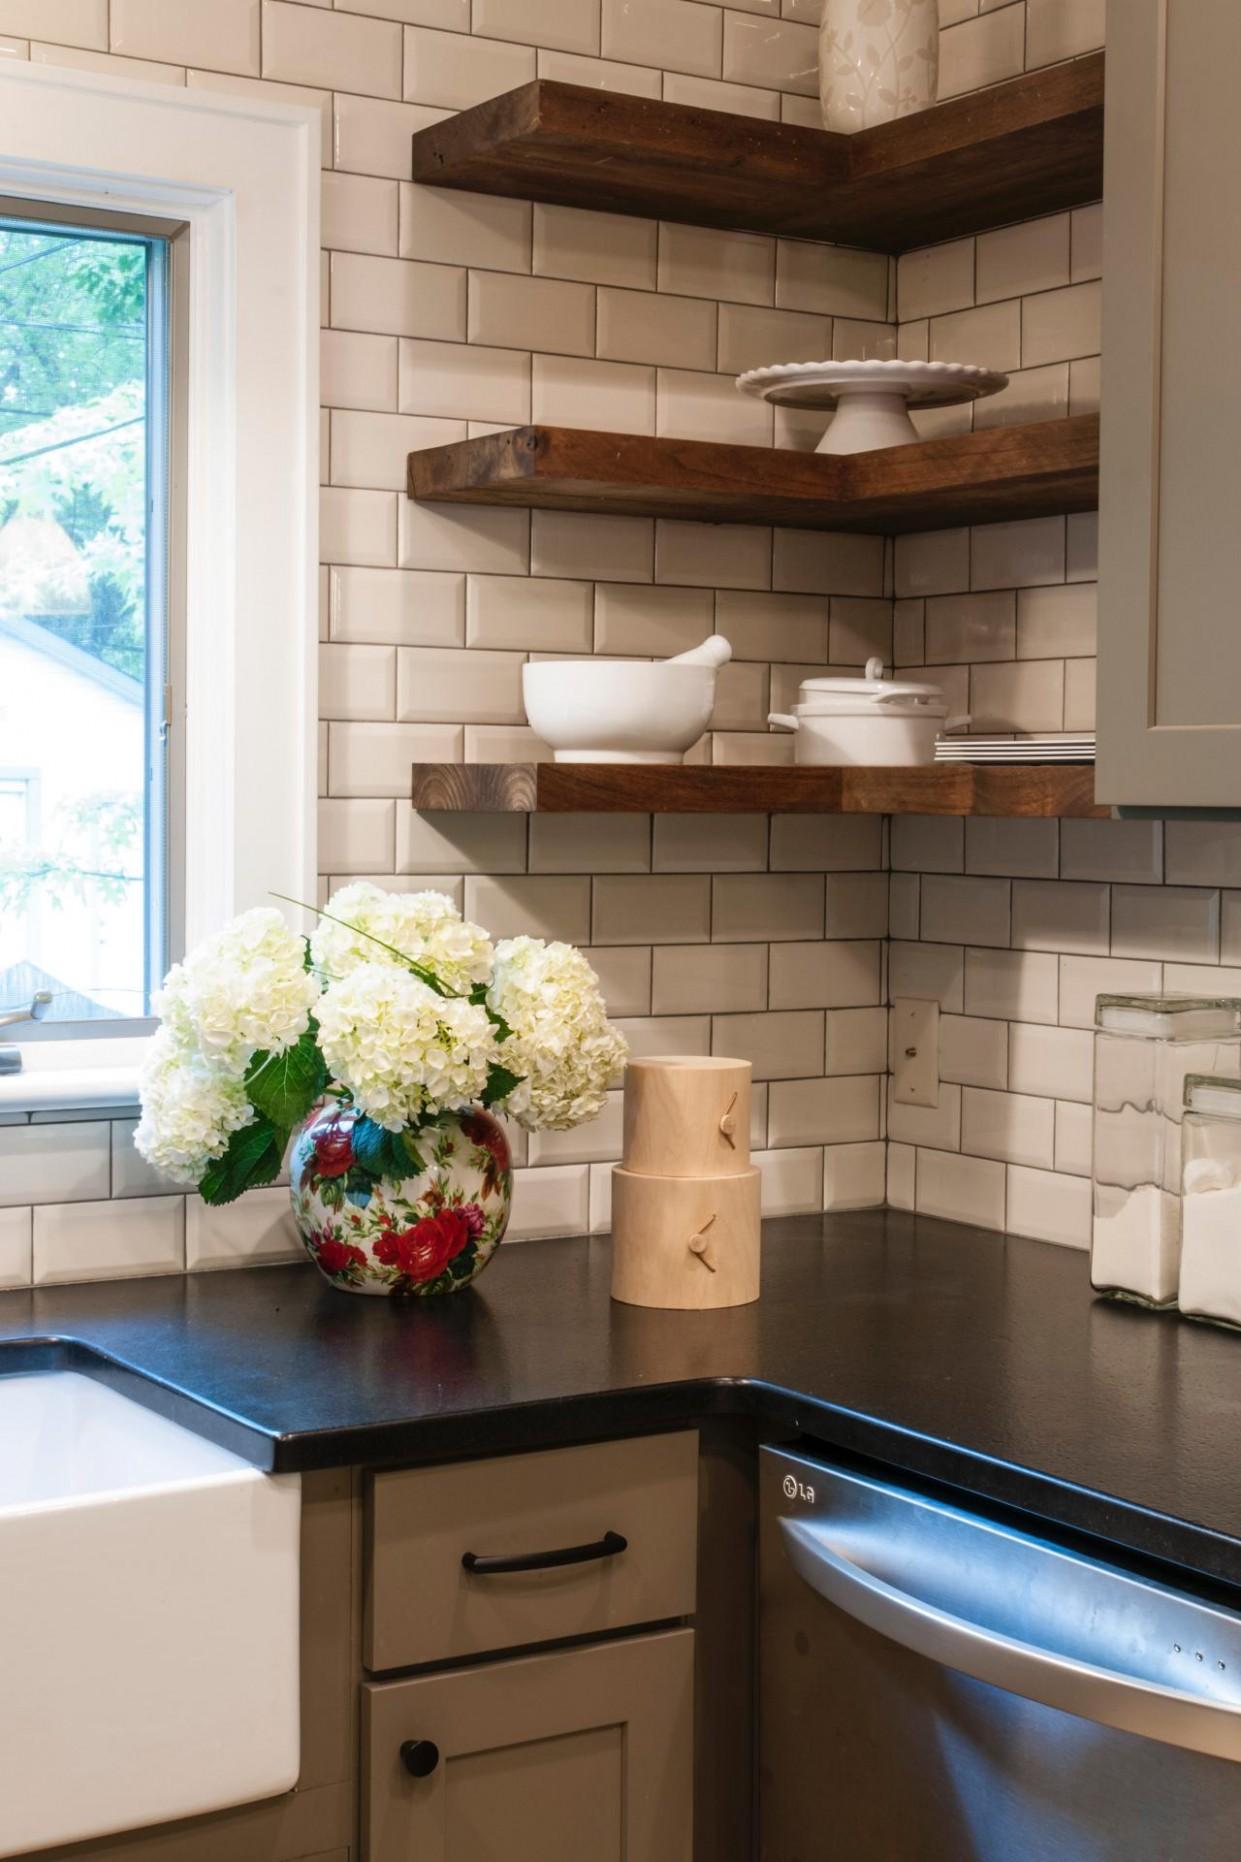 8 Corner Cabinet Ideas That Optimize Your Kitchen Space - Corner Hanging Kitchen Cabinet